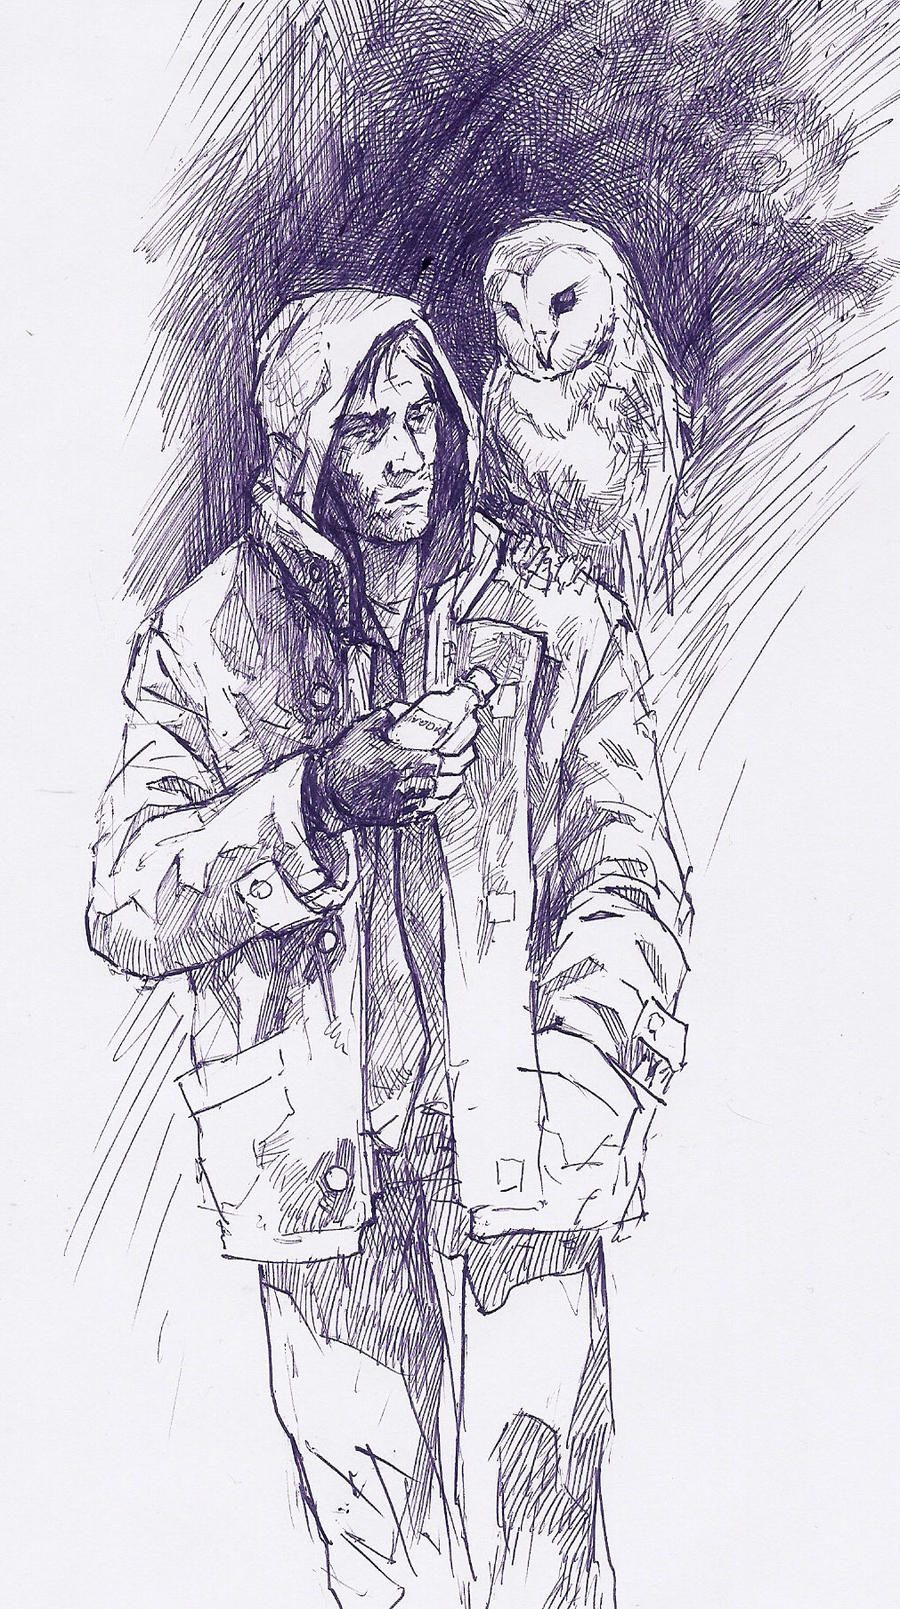 Anton Gorodetsky and Olga the Owl by Hristov13